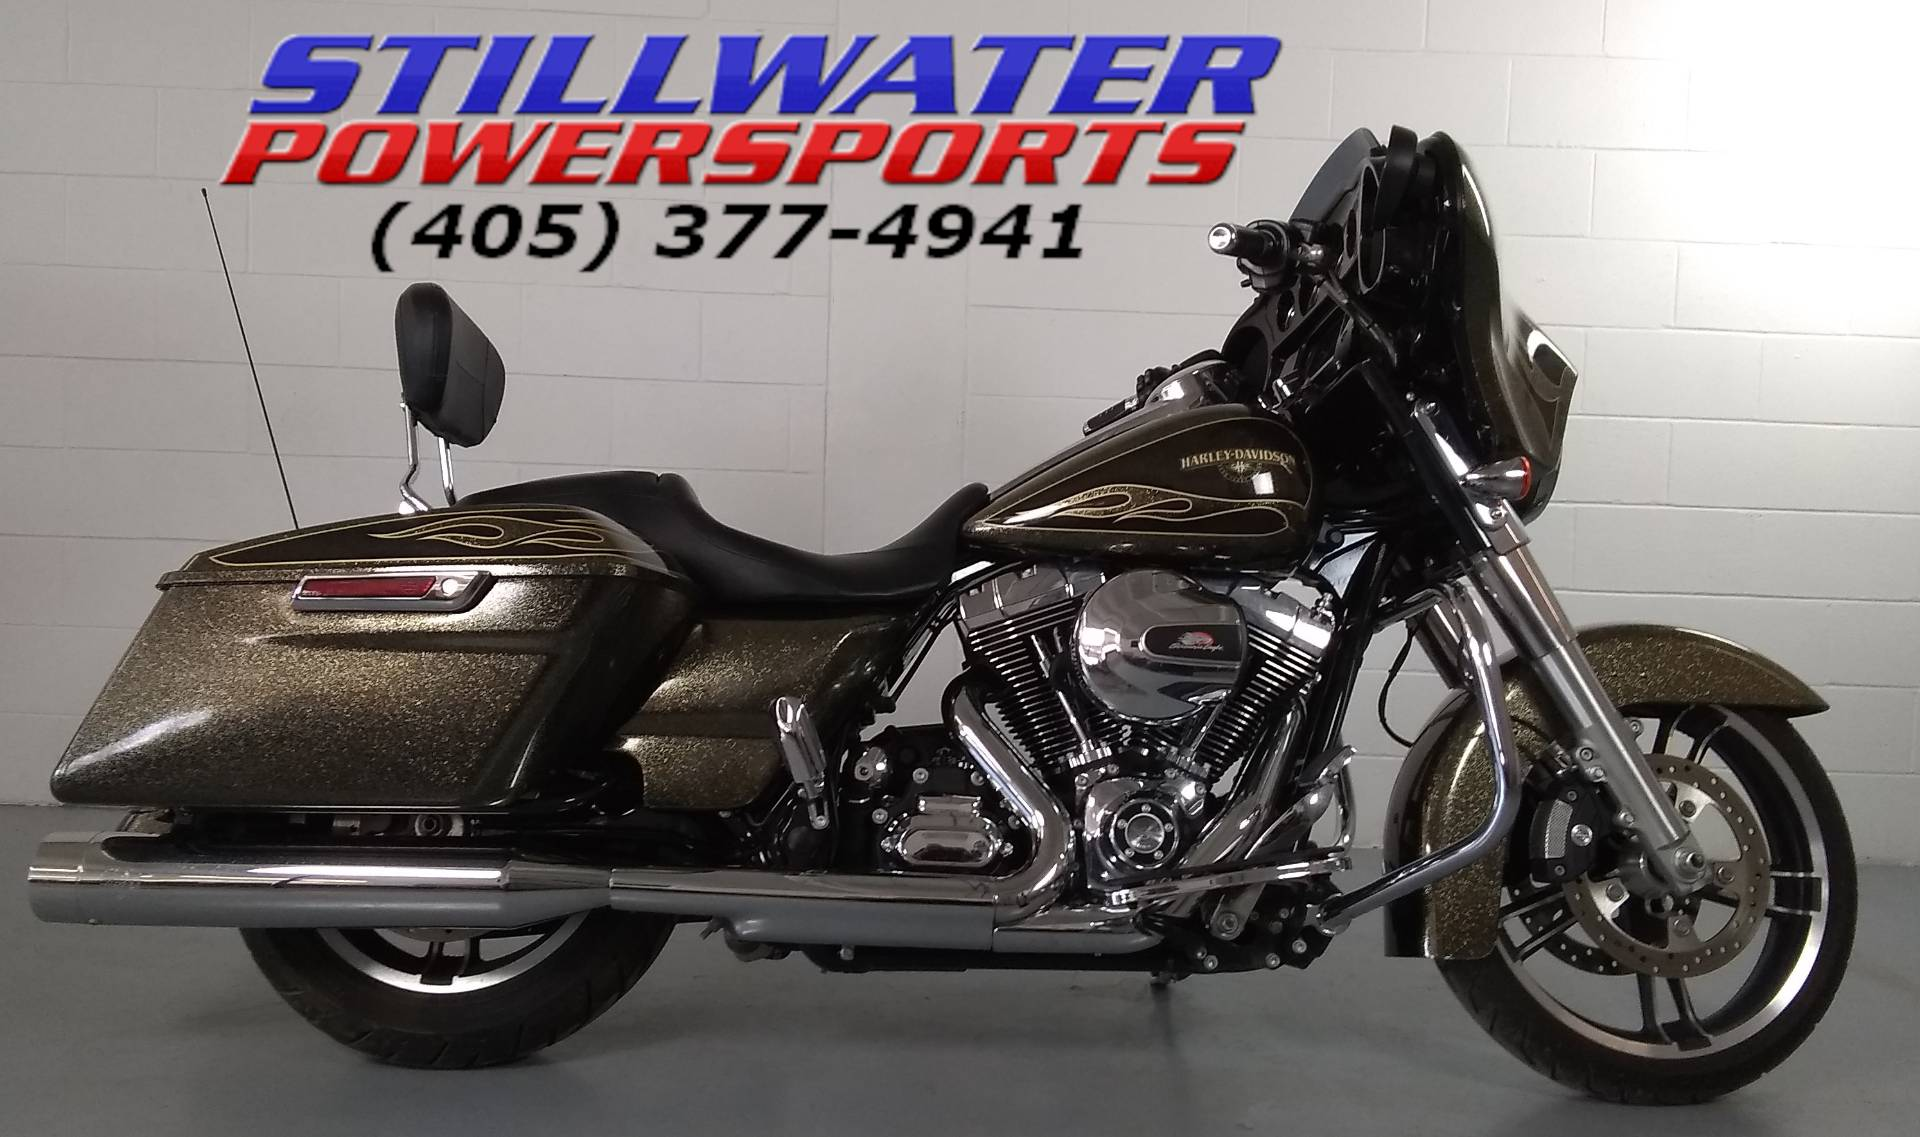 2016 Harley-Davidson Street Glide® Special in Stillwater, Oklahoma